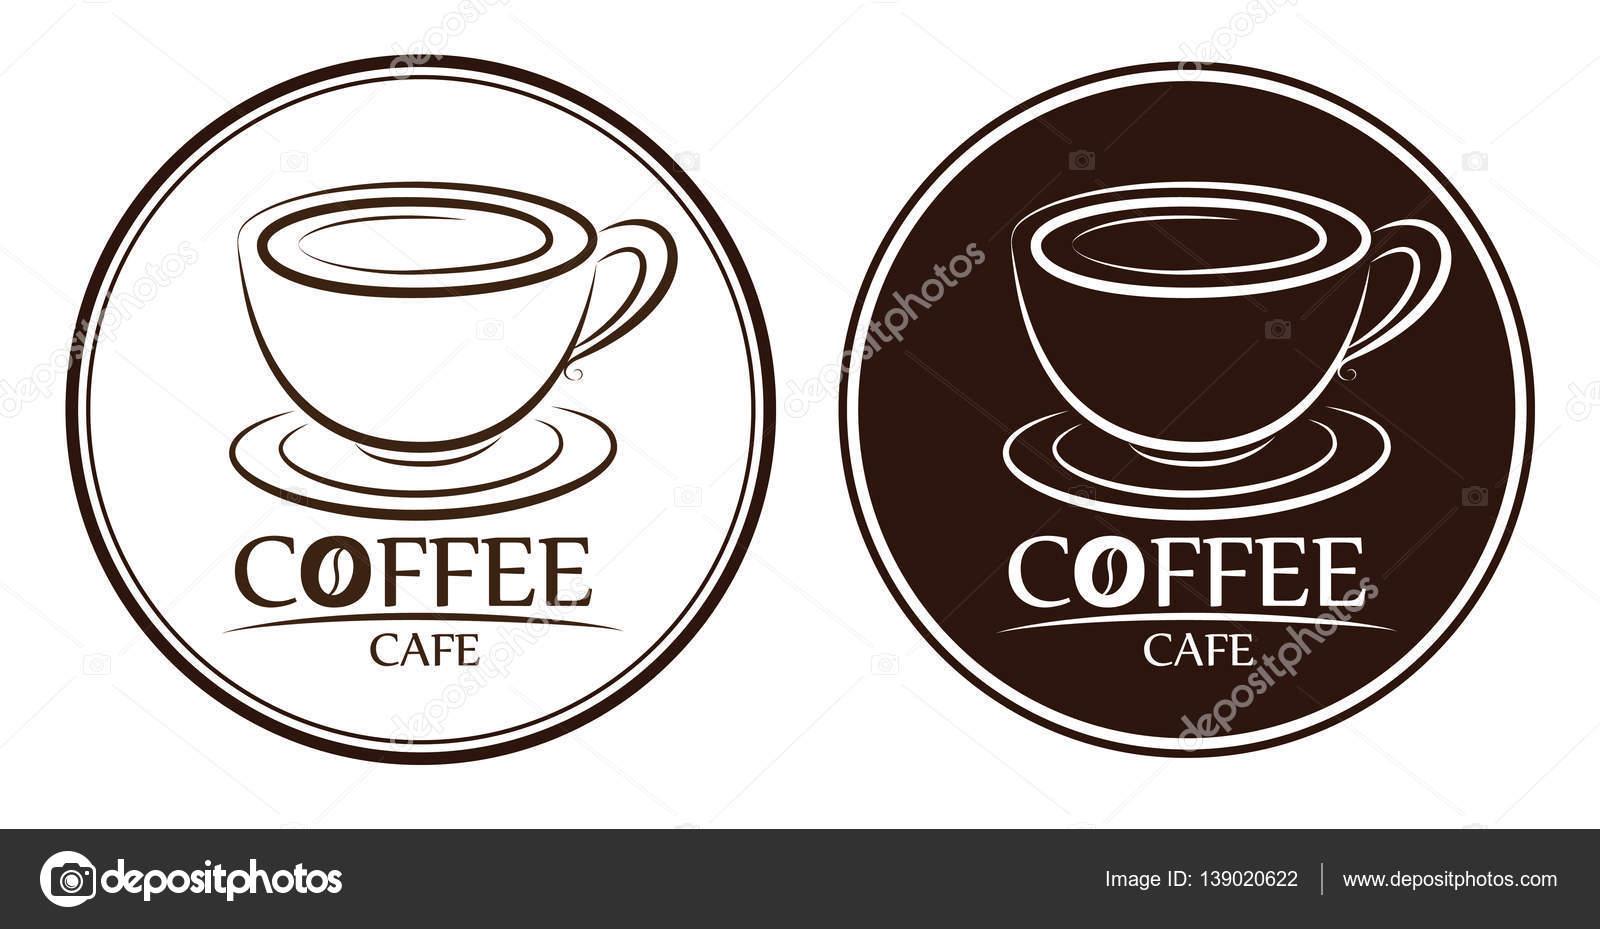 Kaffee-Logo, Beschriftungen, design-Vorlagen — Stockvektor © keangs ...